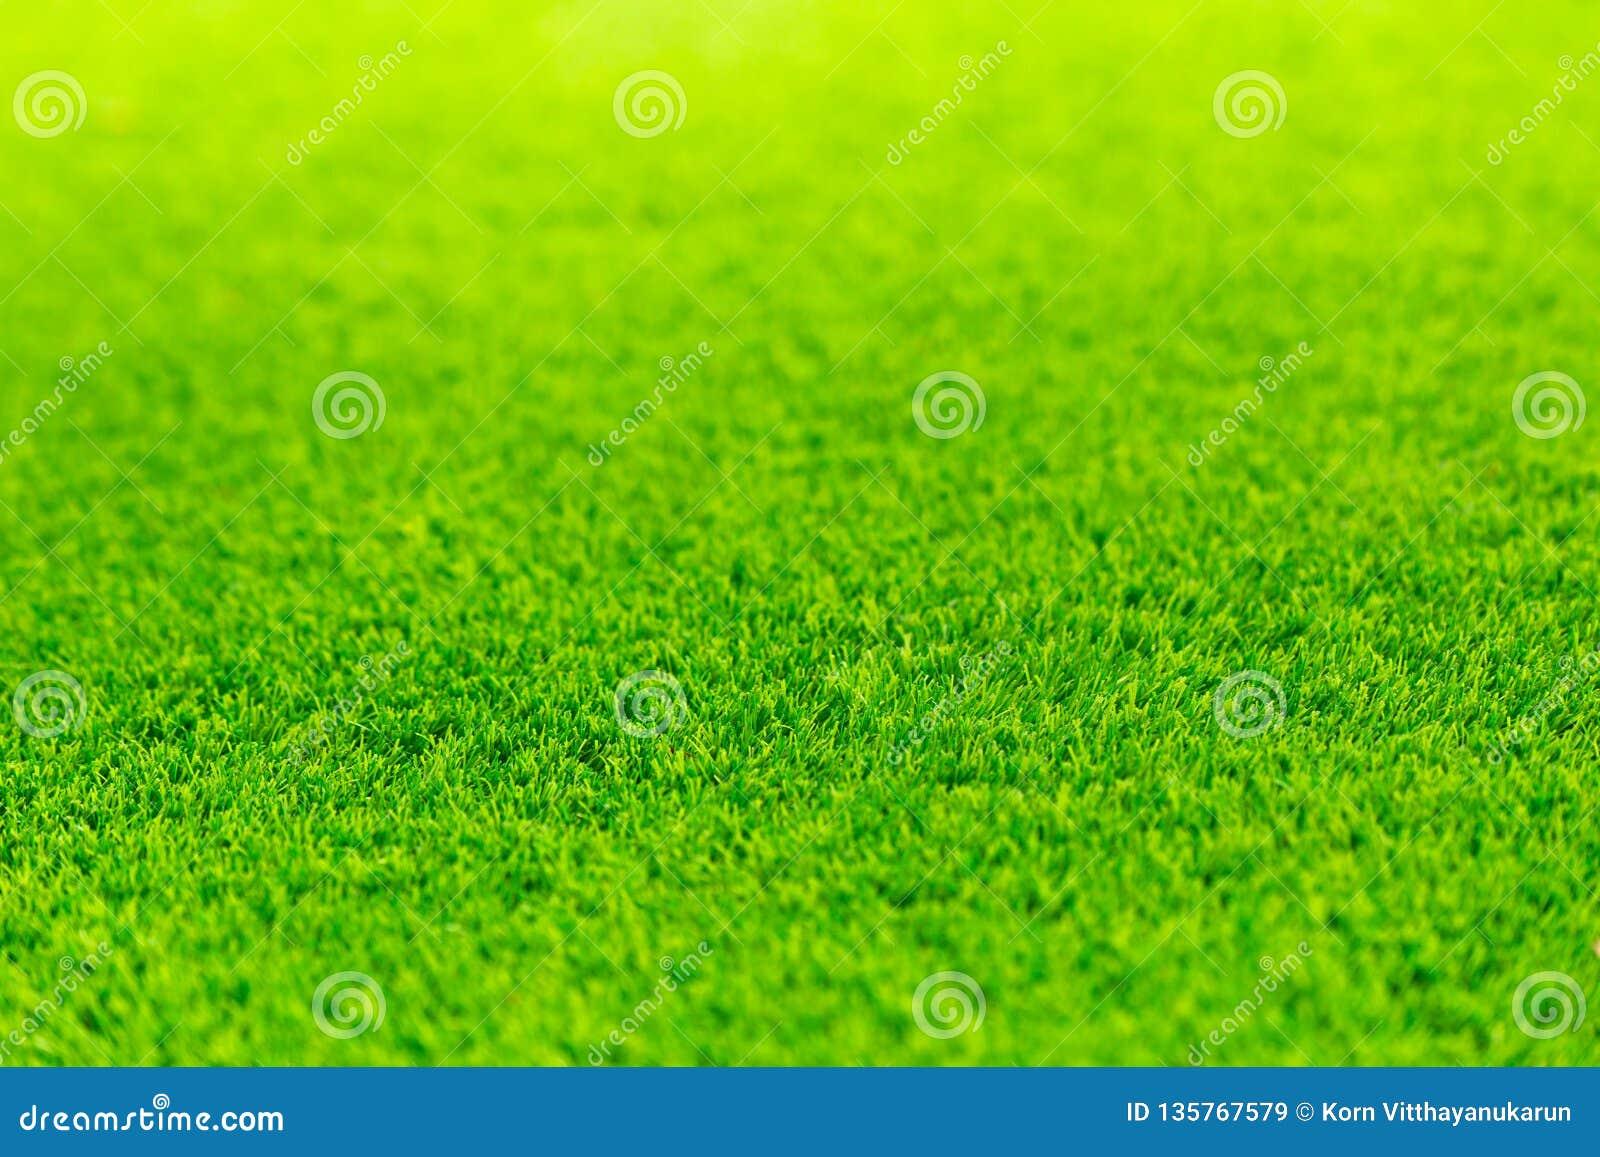 Green grass bright vivid field empty space